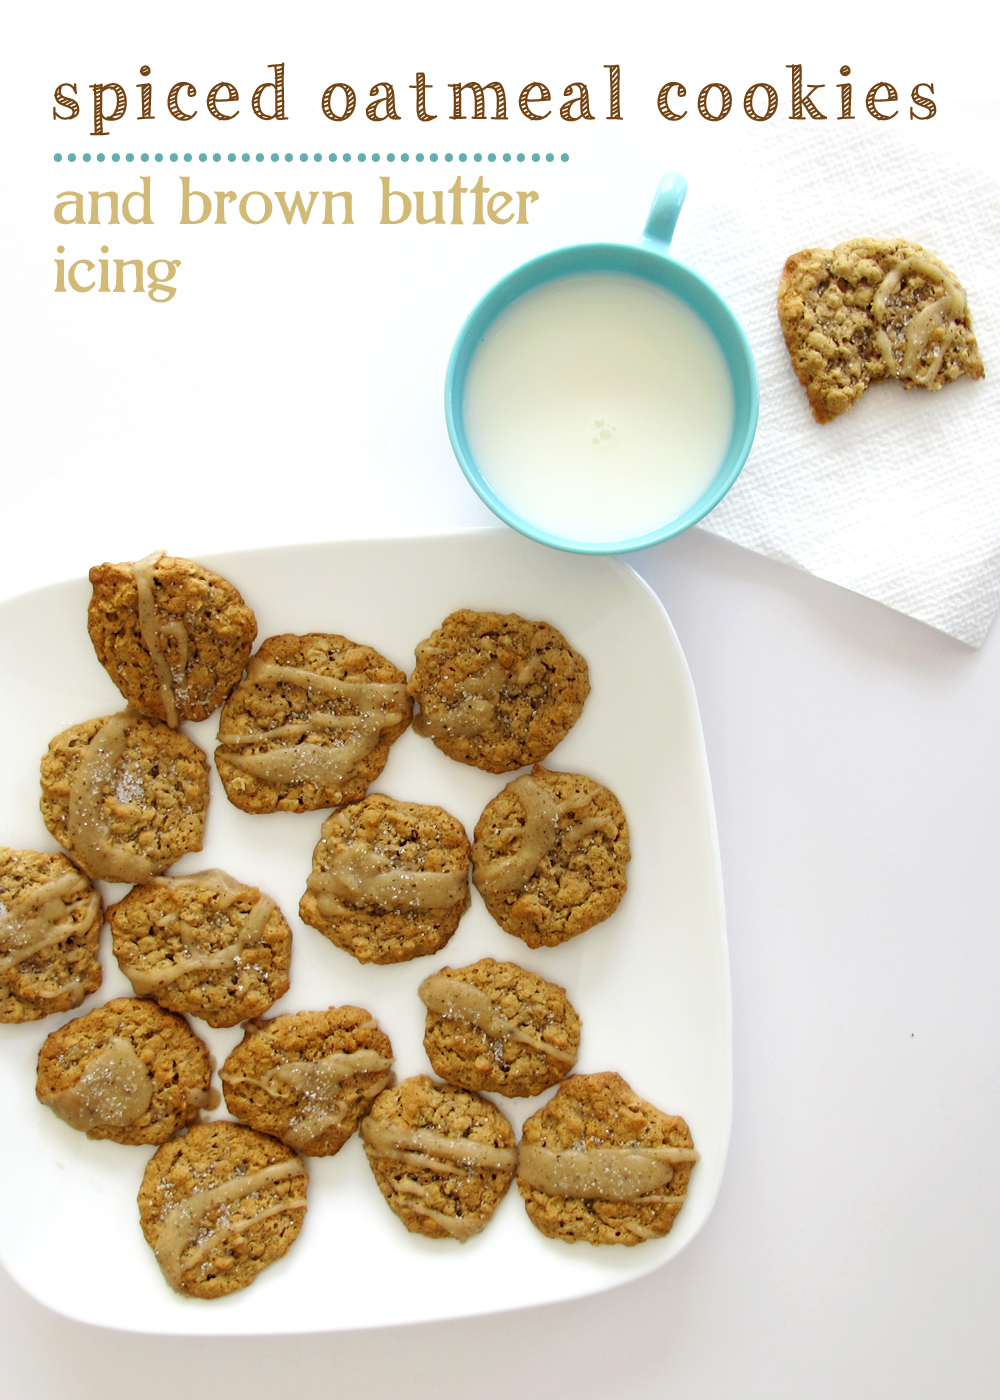 spicedoatmealcookies.jpg